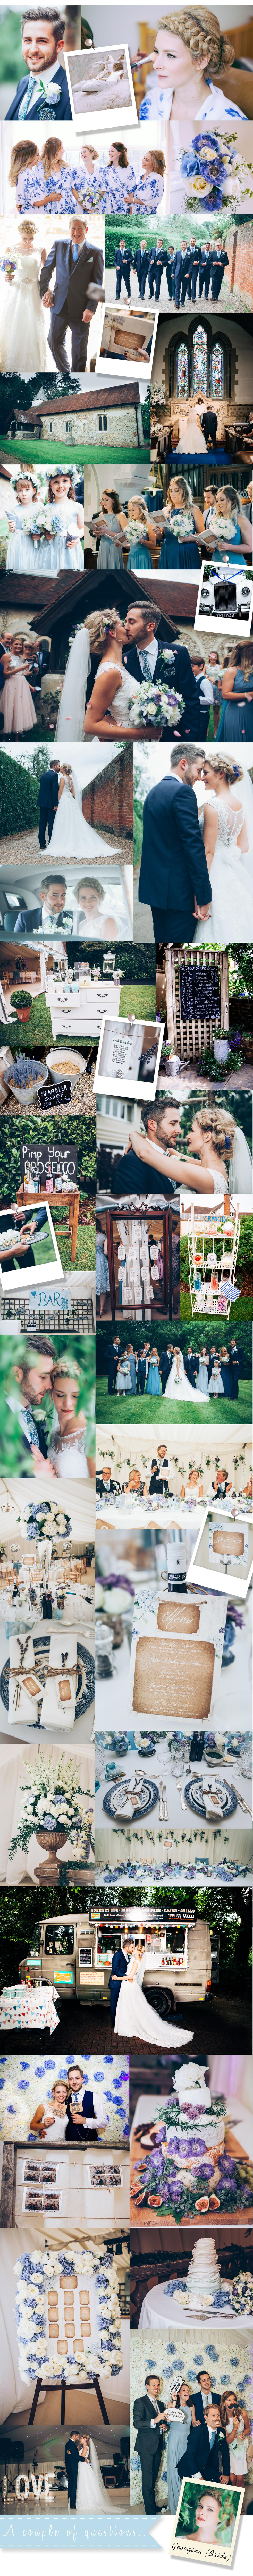 georgie-and-sam-wedding_blog-post